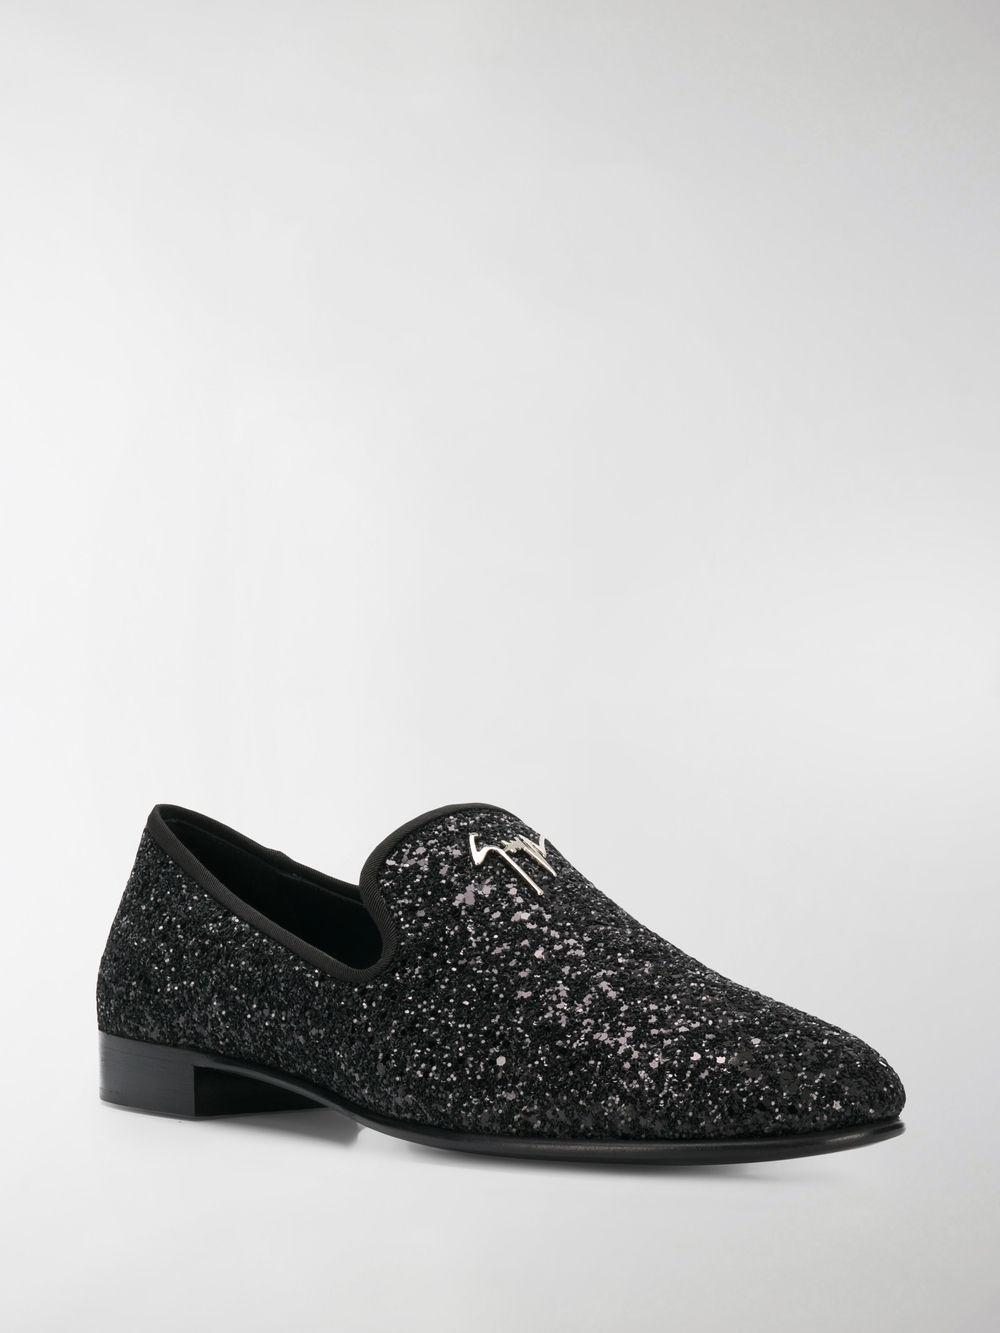 c7c12c41beef Lyst - Giuseppe Zanotti Glitter Loafers in Black for Men - Save 21%